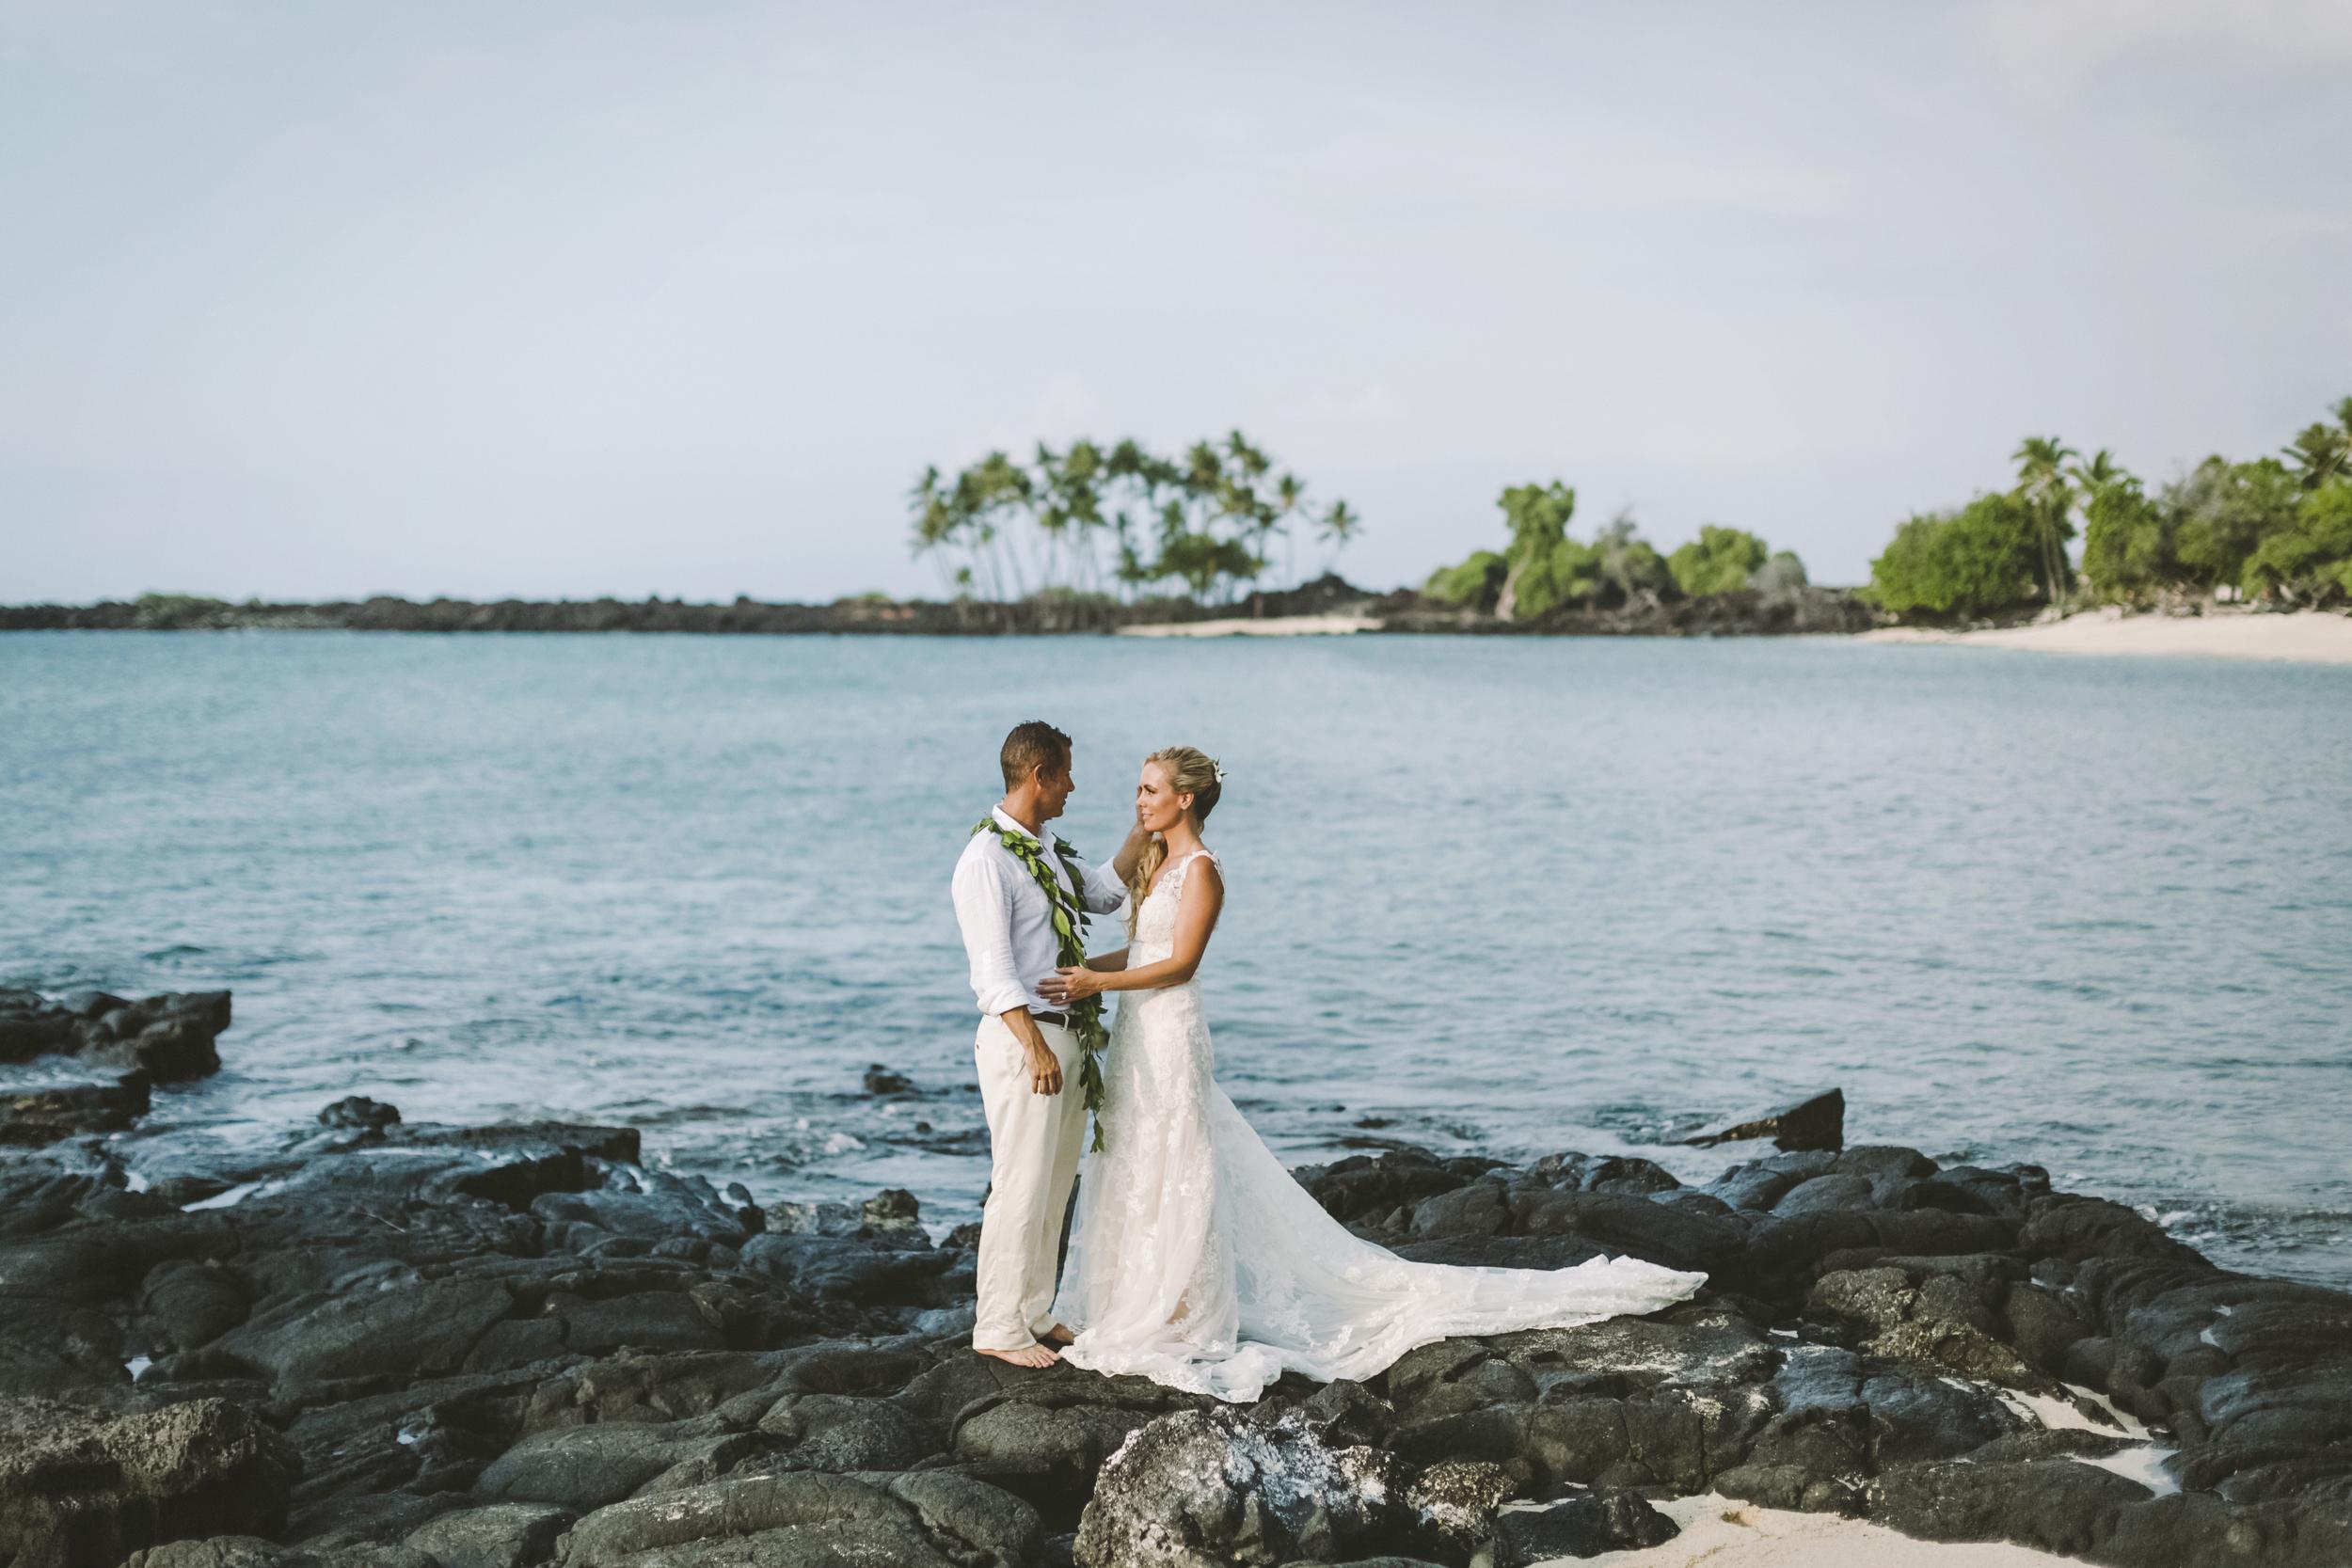 angie-diaz-photography-hawaii-wedding-photographer-kelli-jay-1.jpg